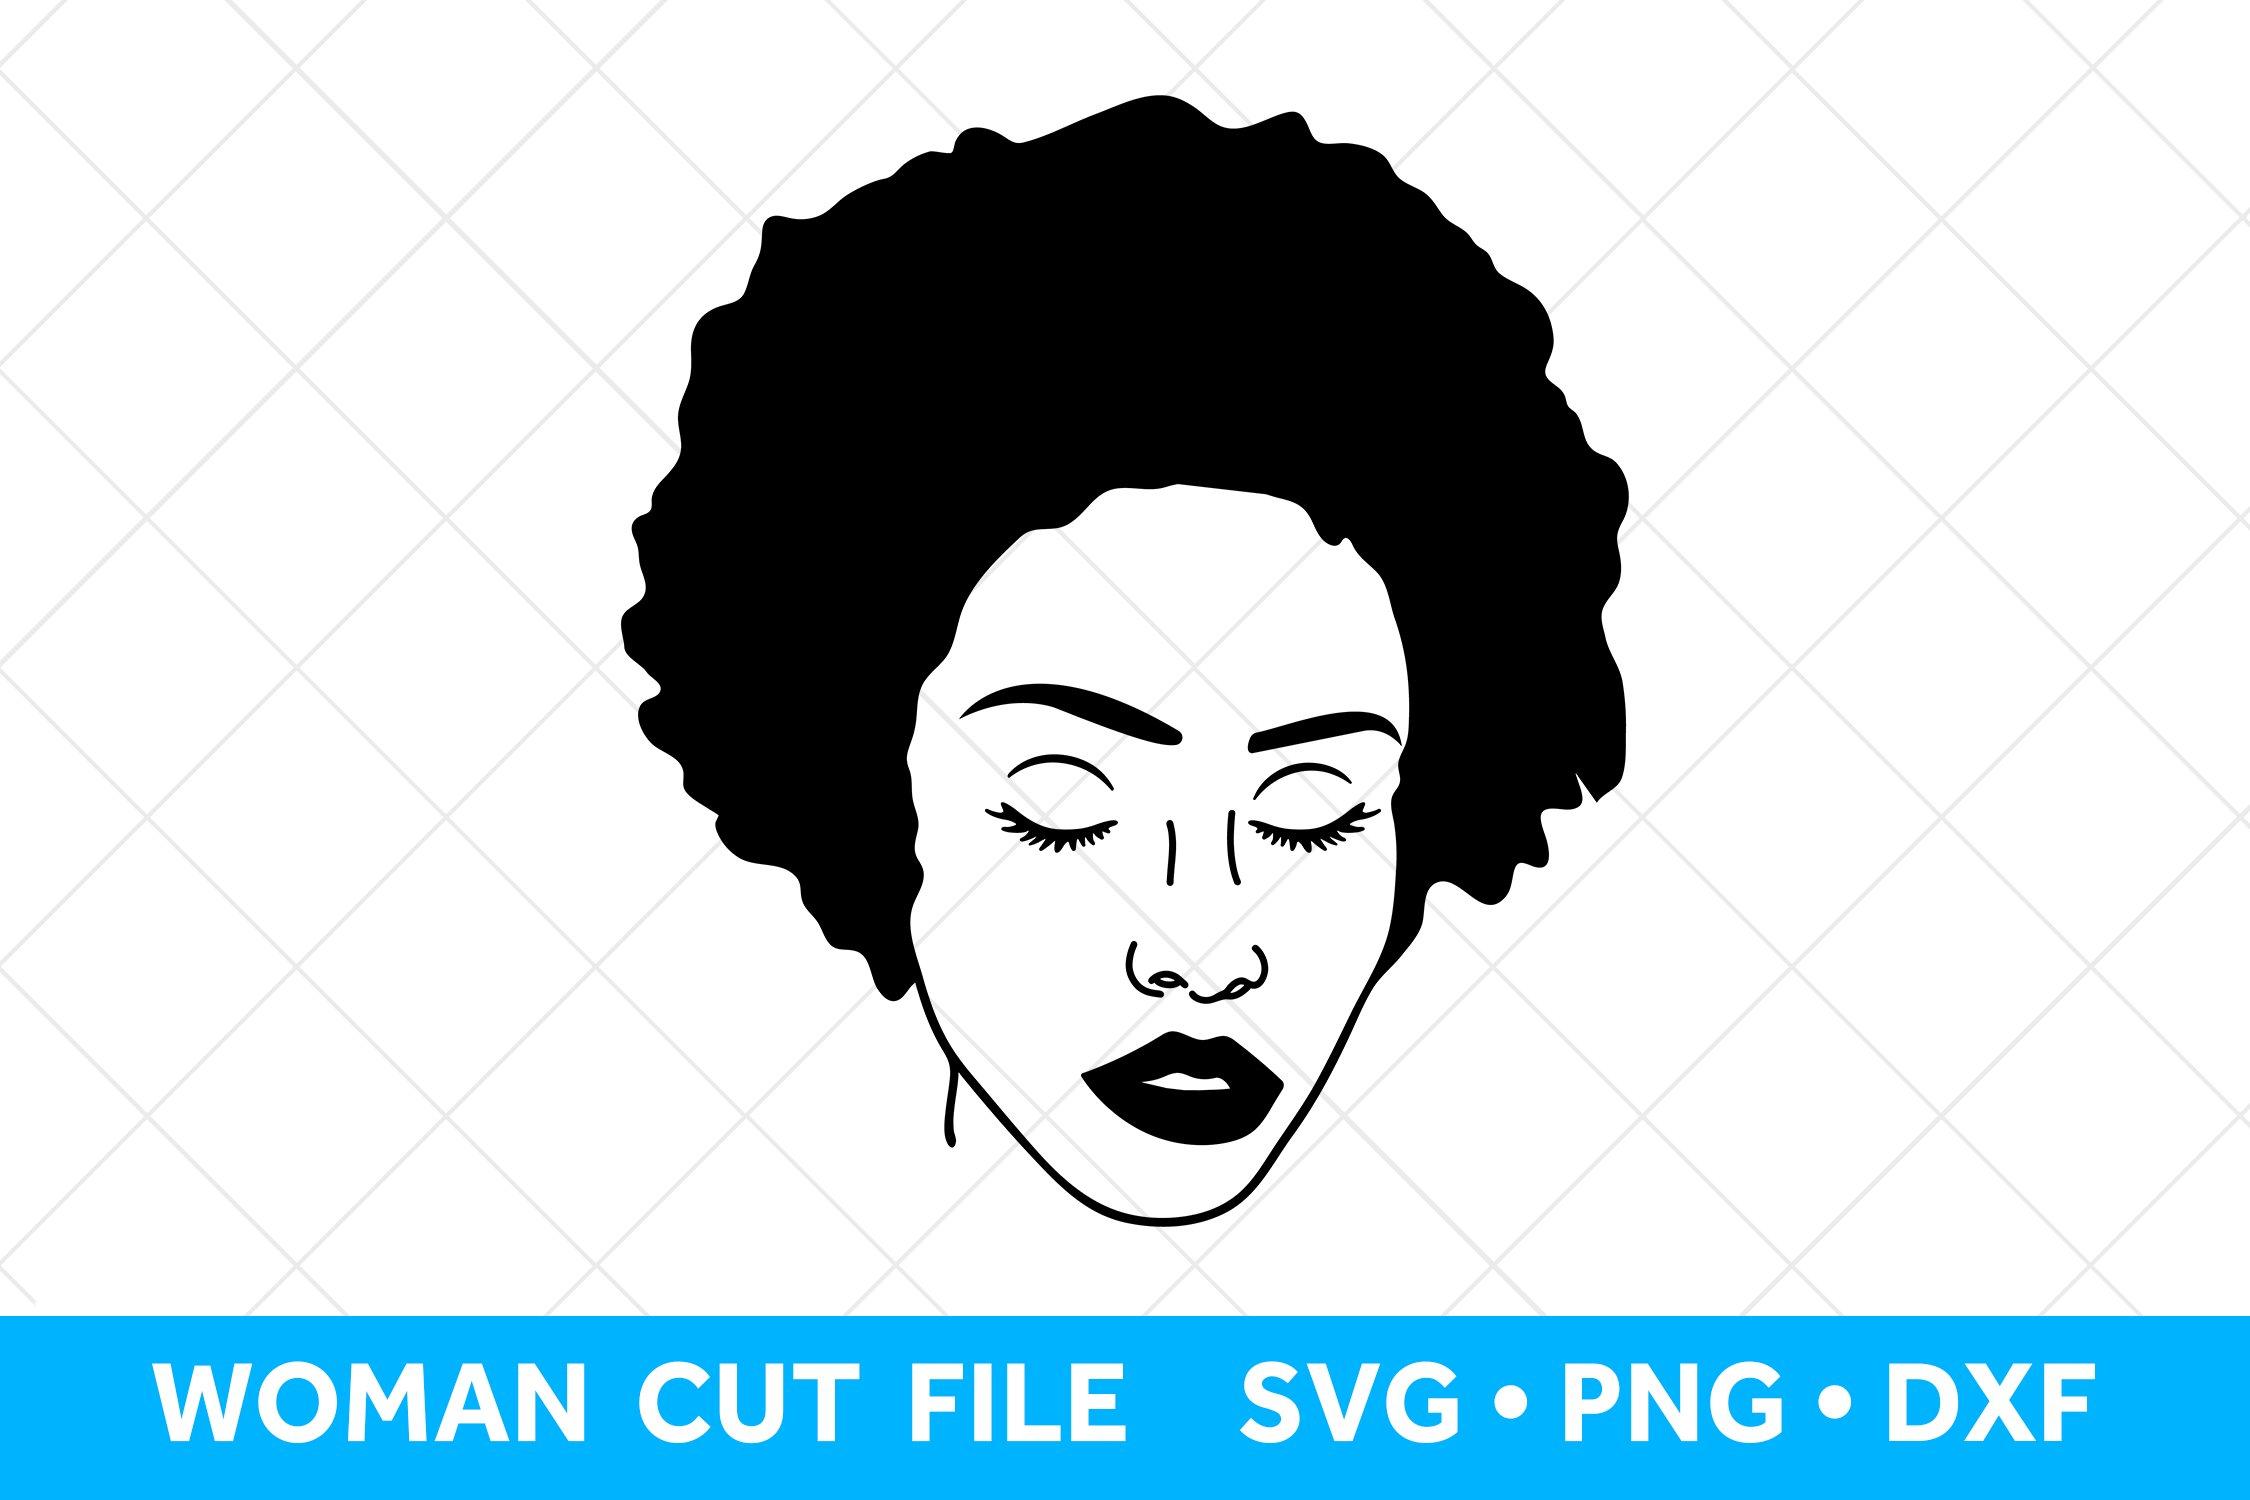 Black Girl Silhouette Women Clip Art Blessed Women Clipart Cut for Commercial Use Eps Black Afro Girl SVG Cricut File DXF Png